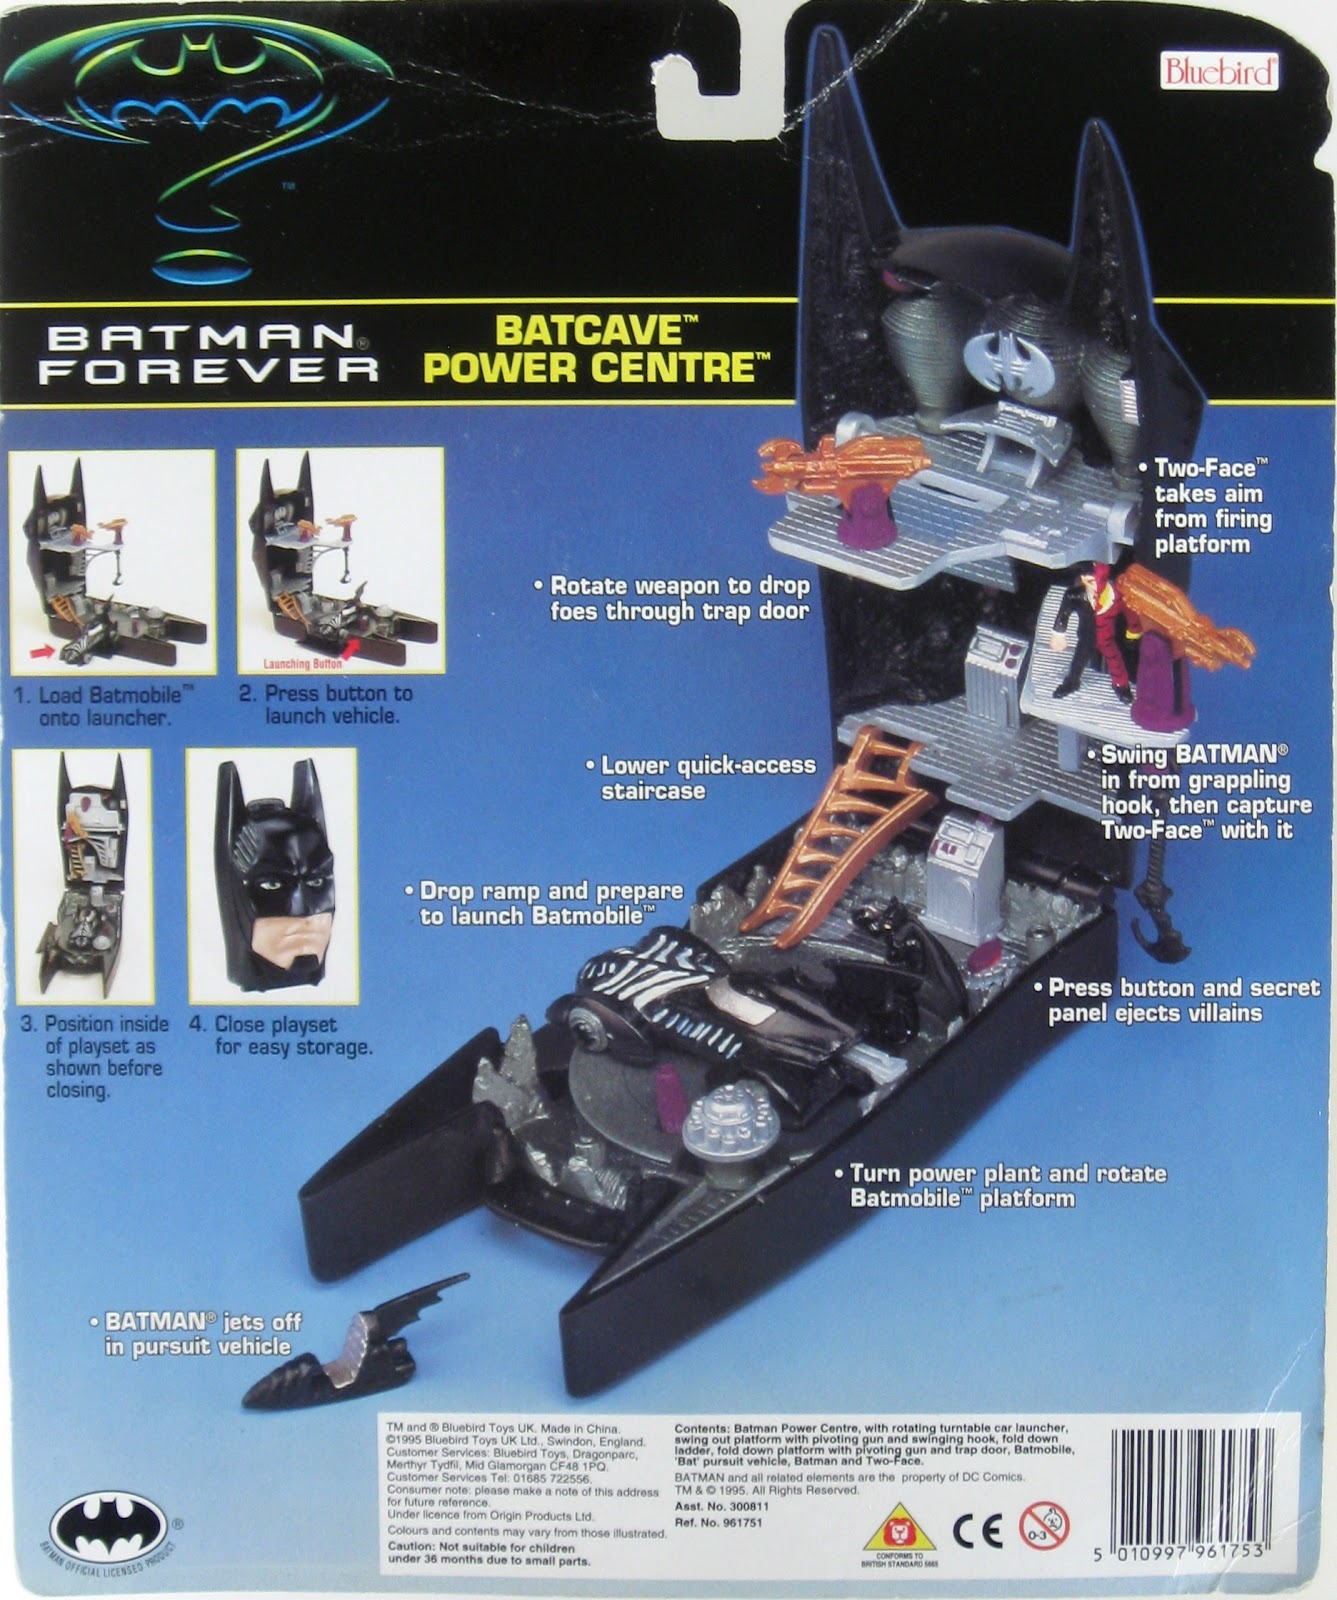 batcavepowercenter2.JPG